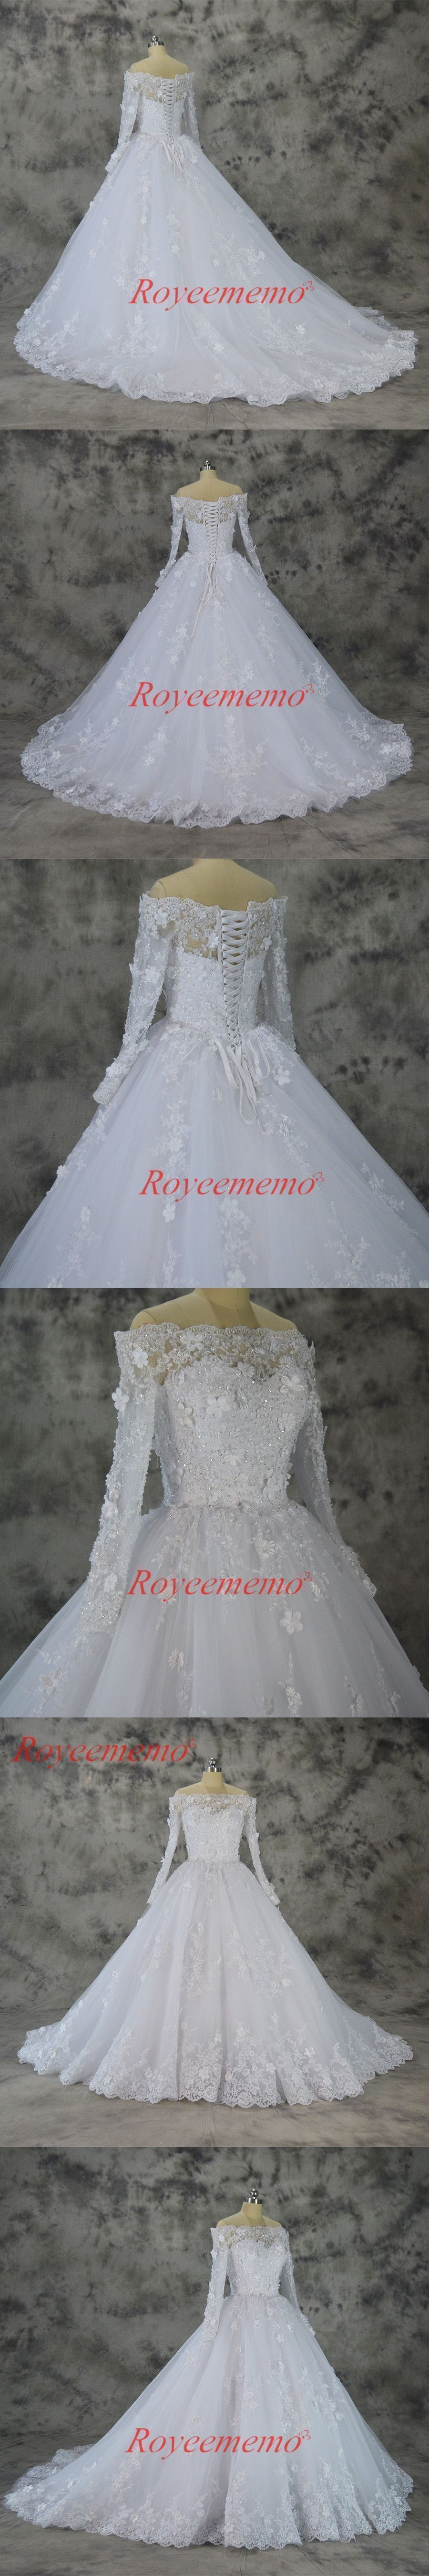 new design vestido de noiva boat neck lace wedding dress off